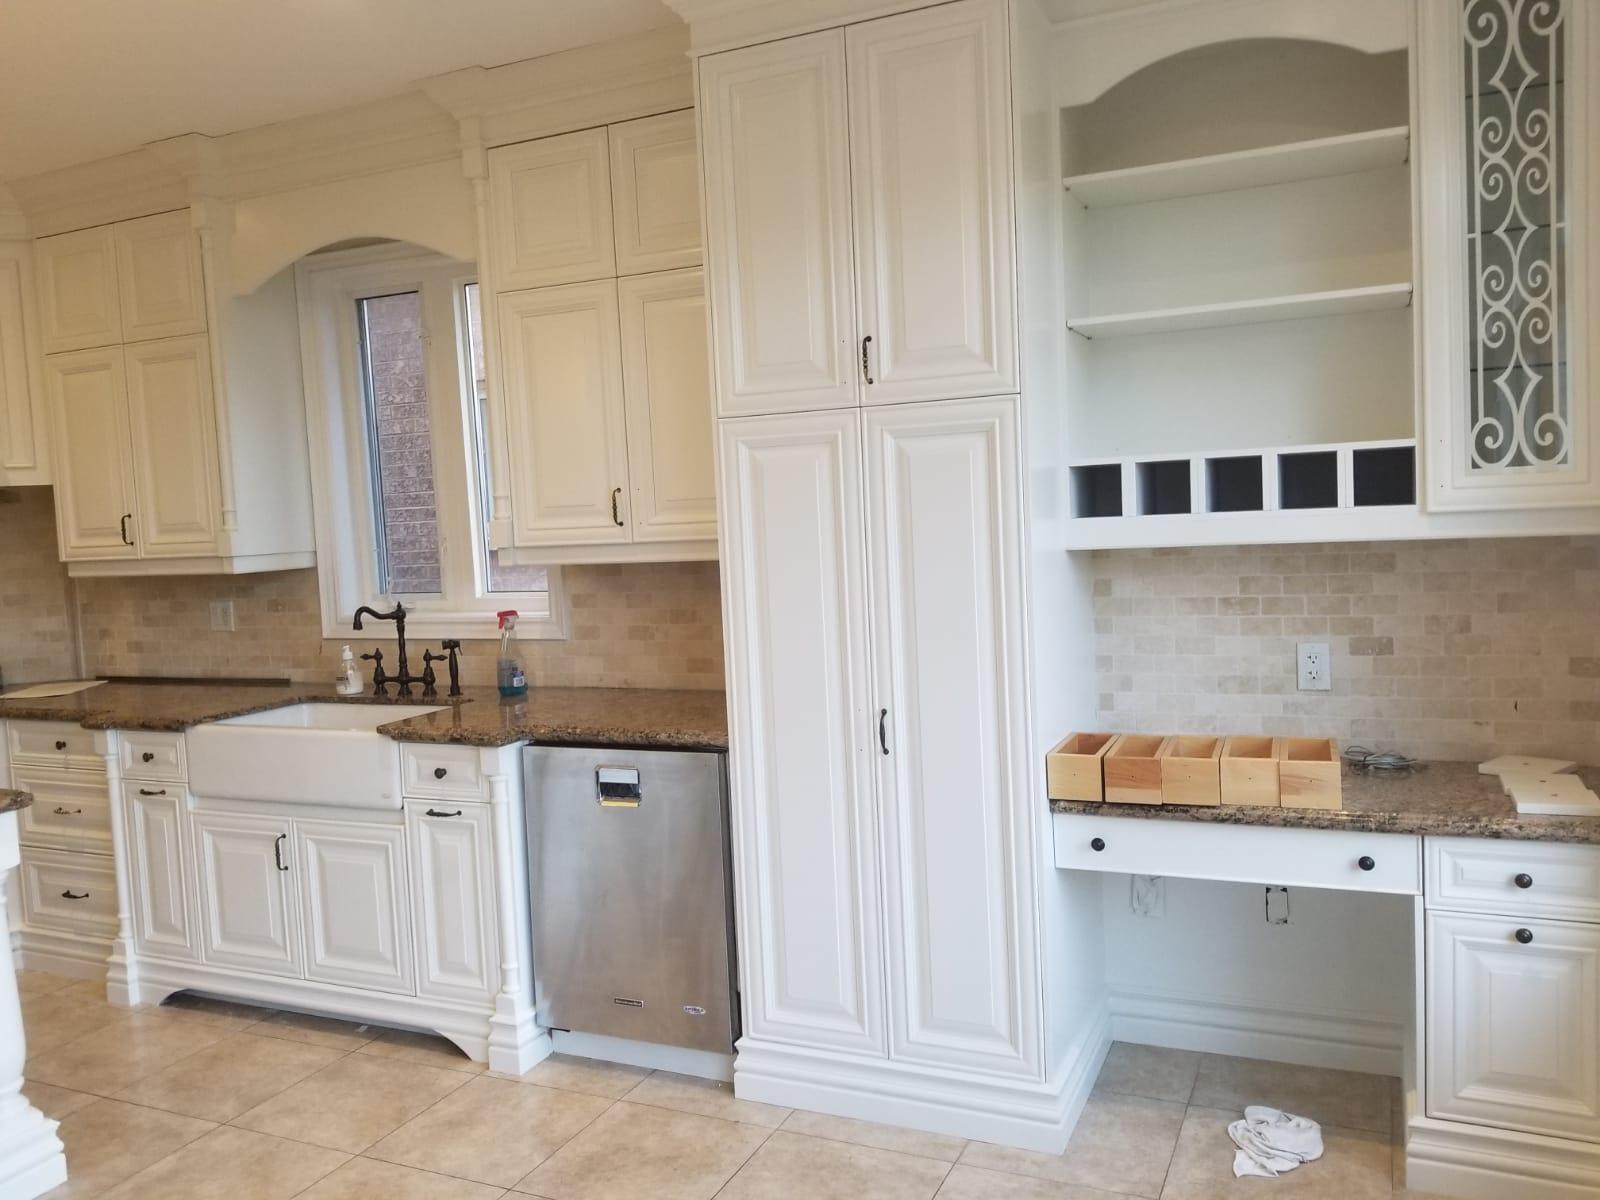 Kitchen Cabinet Refinishing Painting Toronto Cabinet Paints